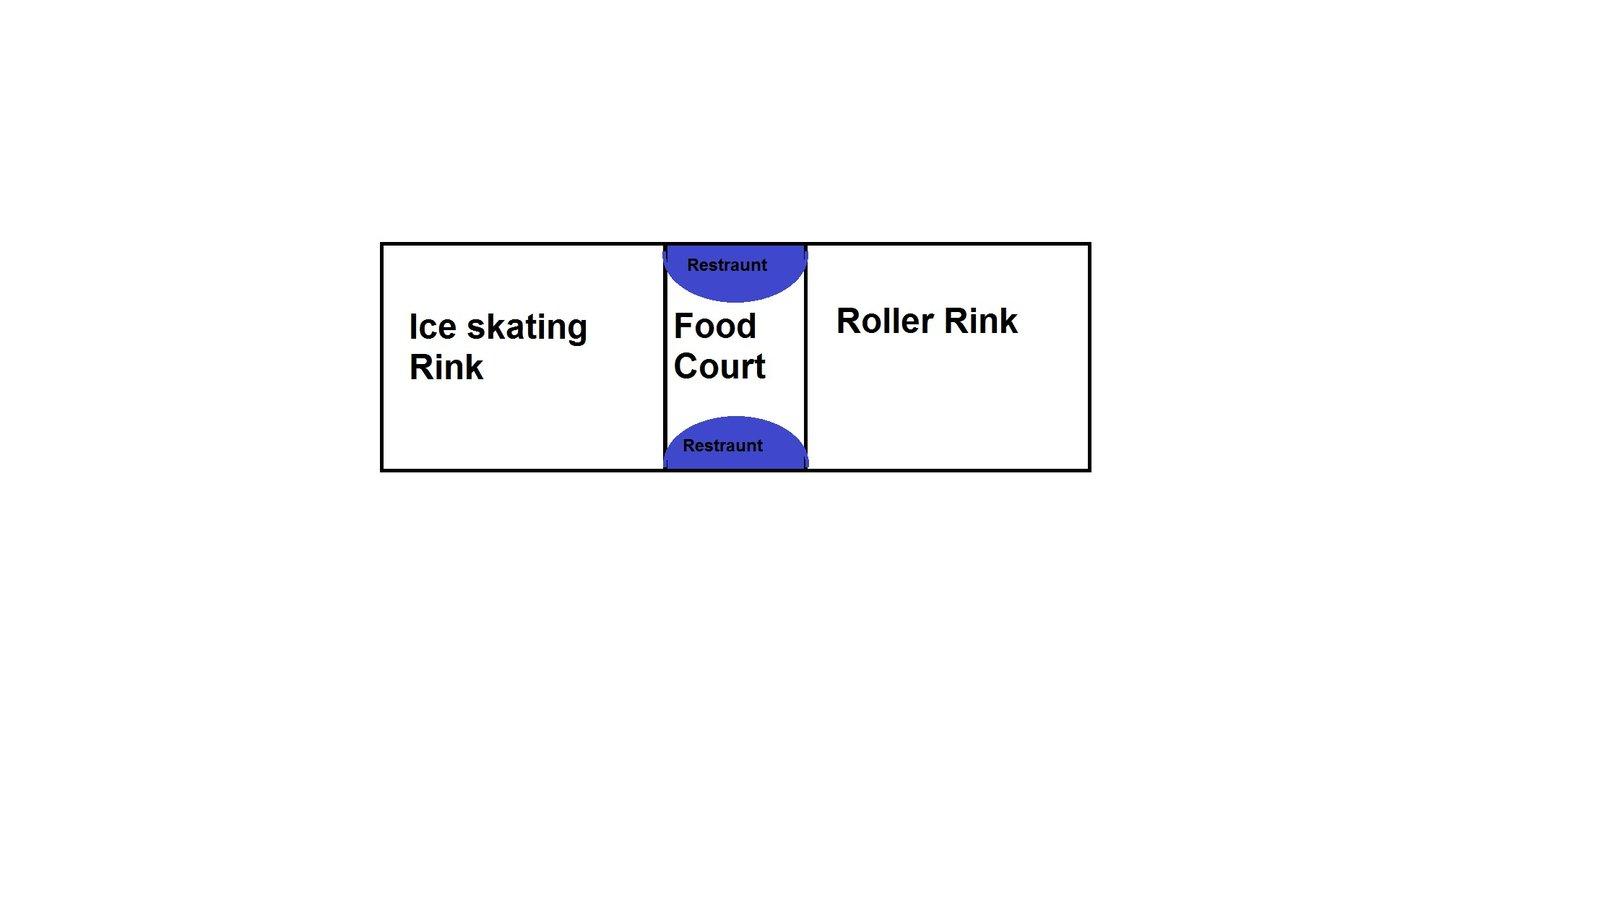 Roller skating rink lafayette in - Roller And Ice Skating Rink Titusville Fl